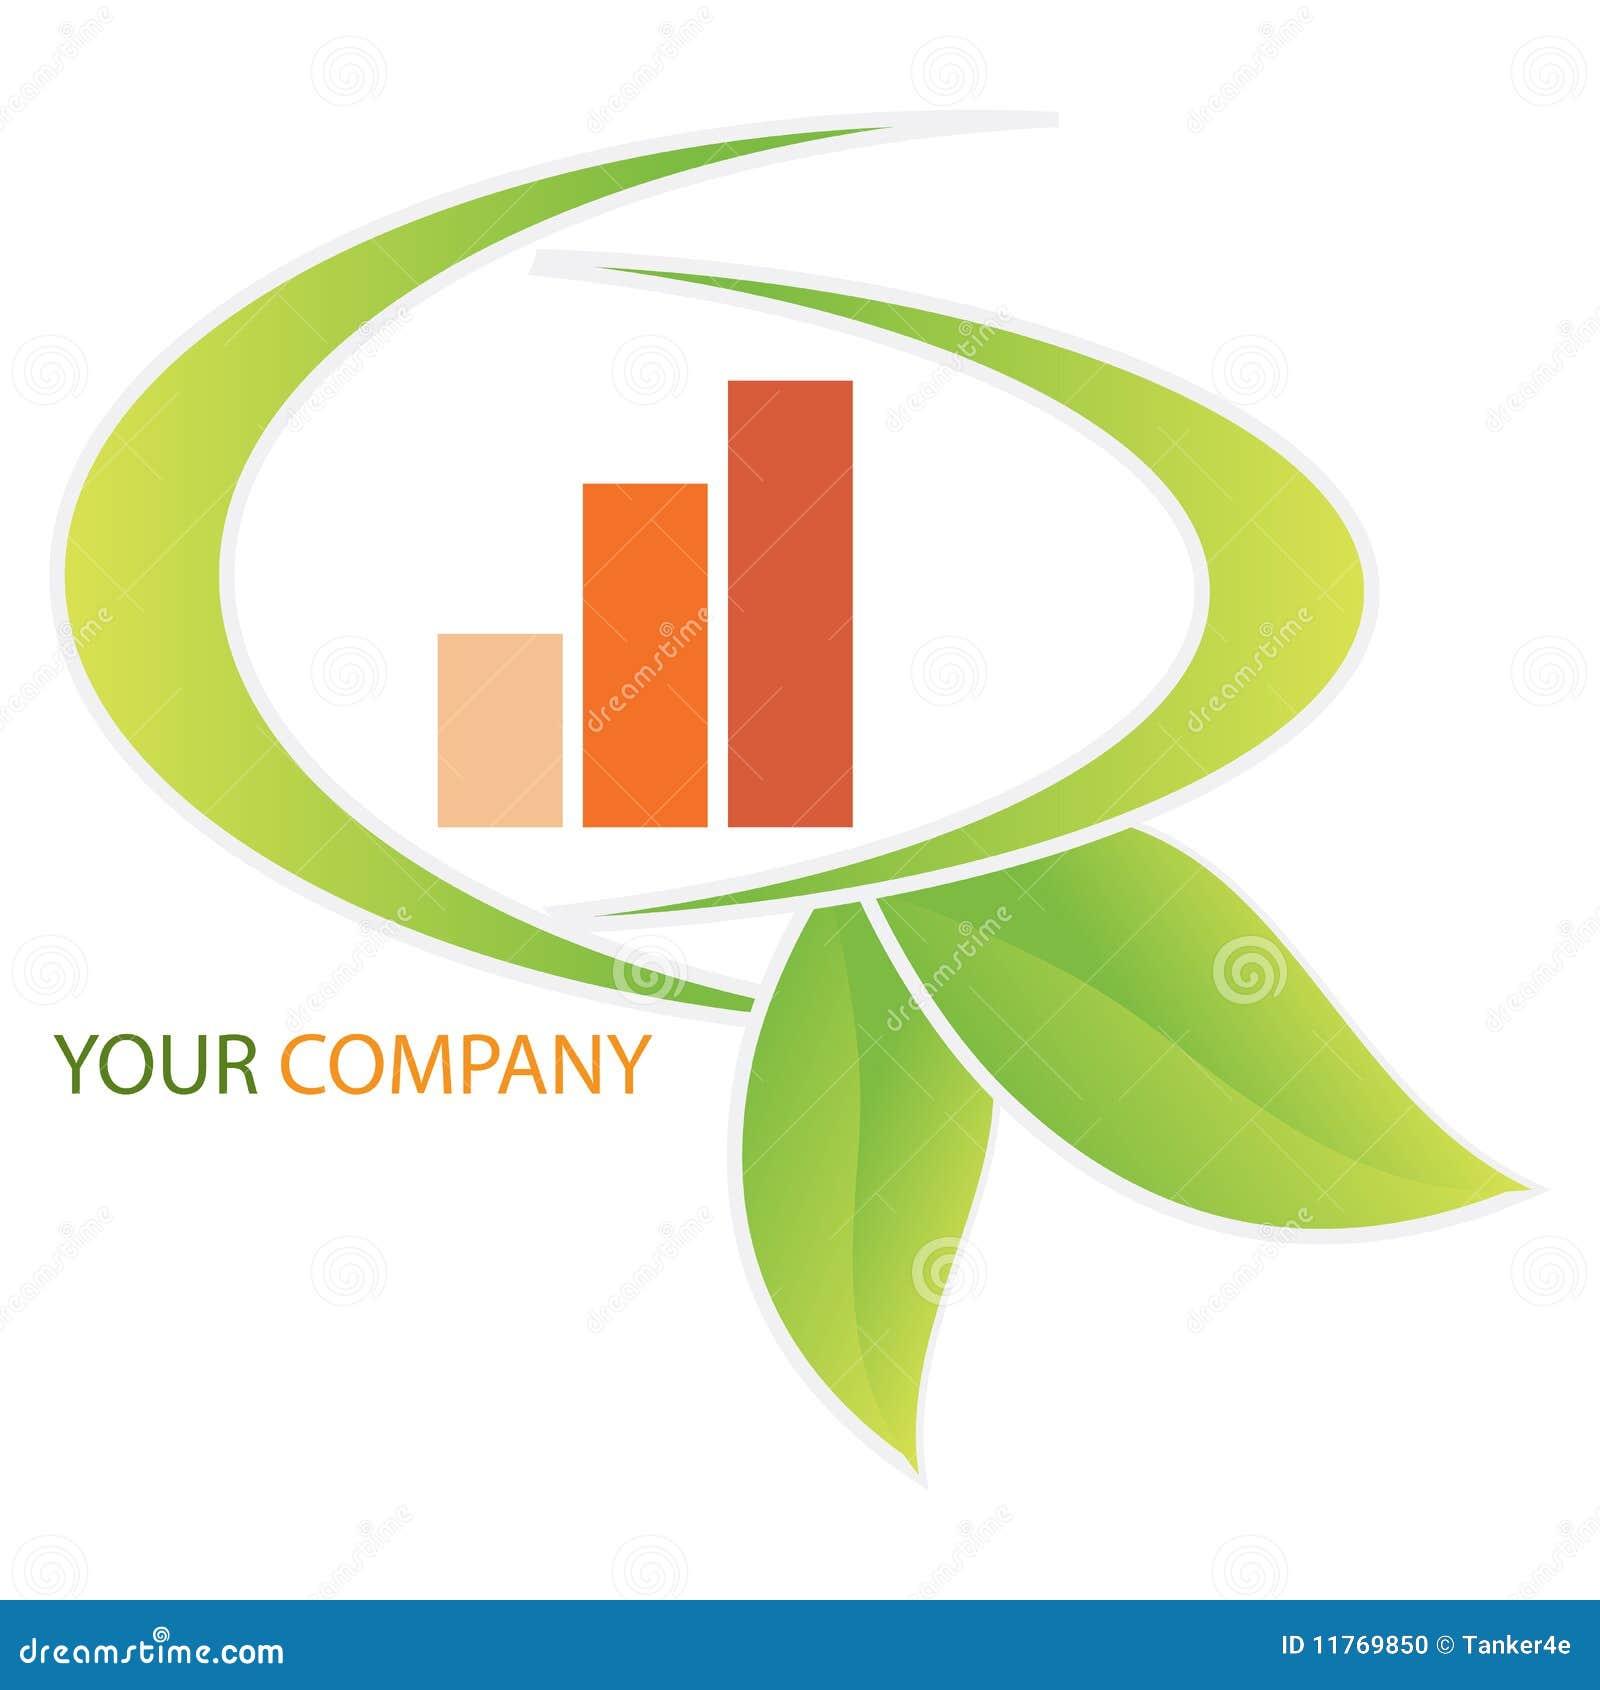 nfc companies stocks